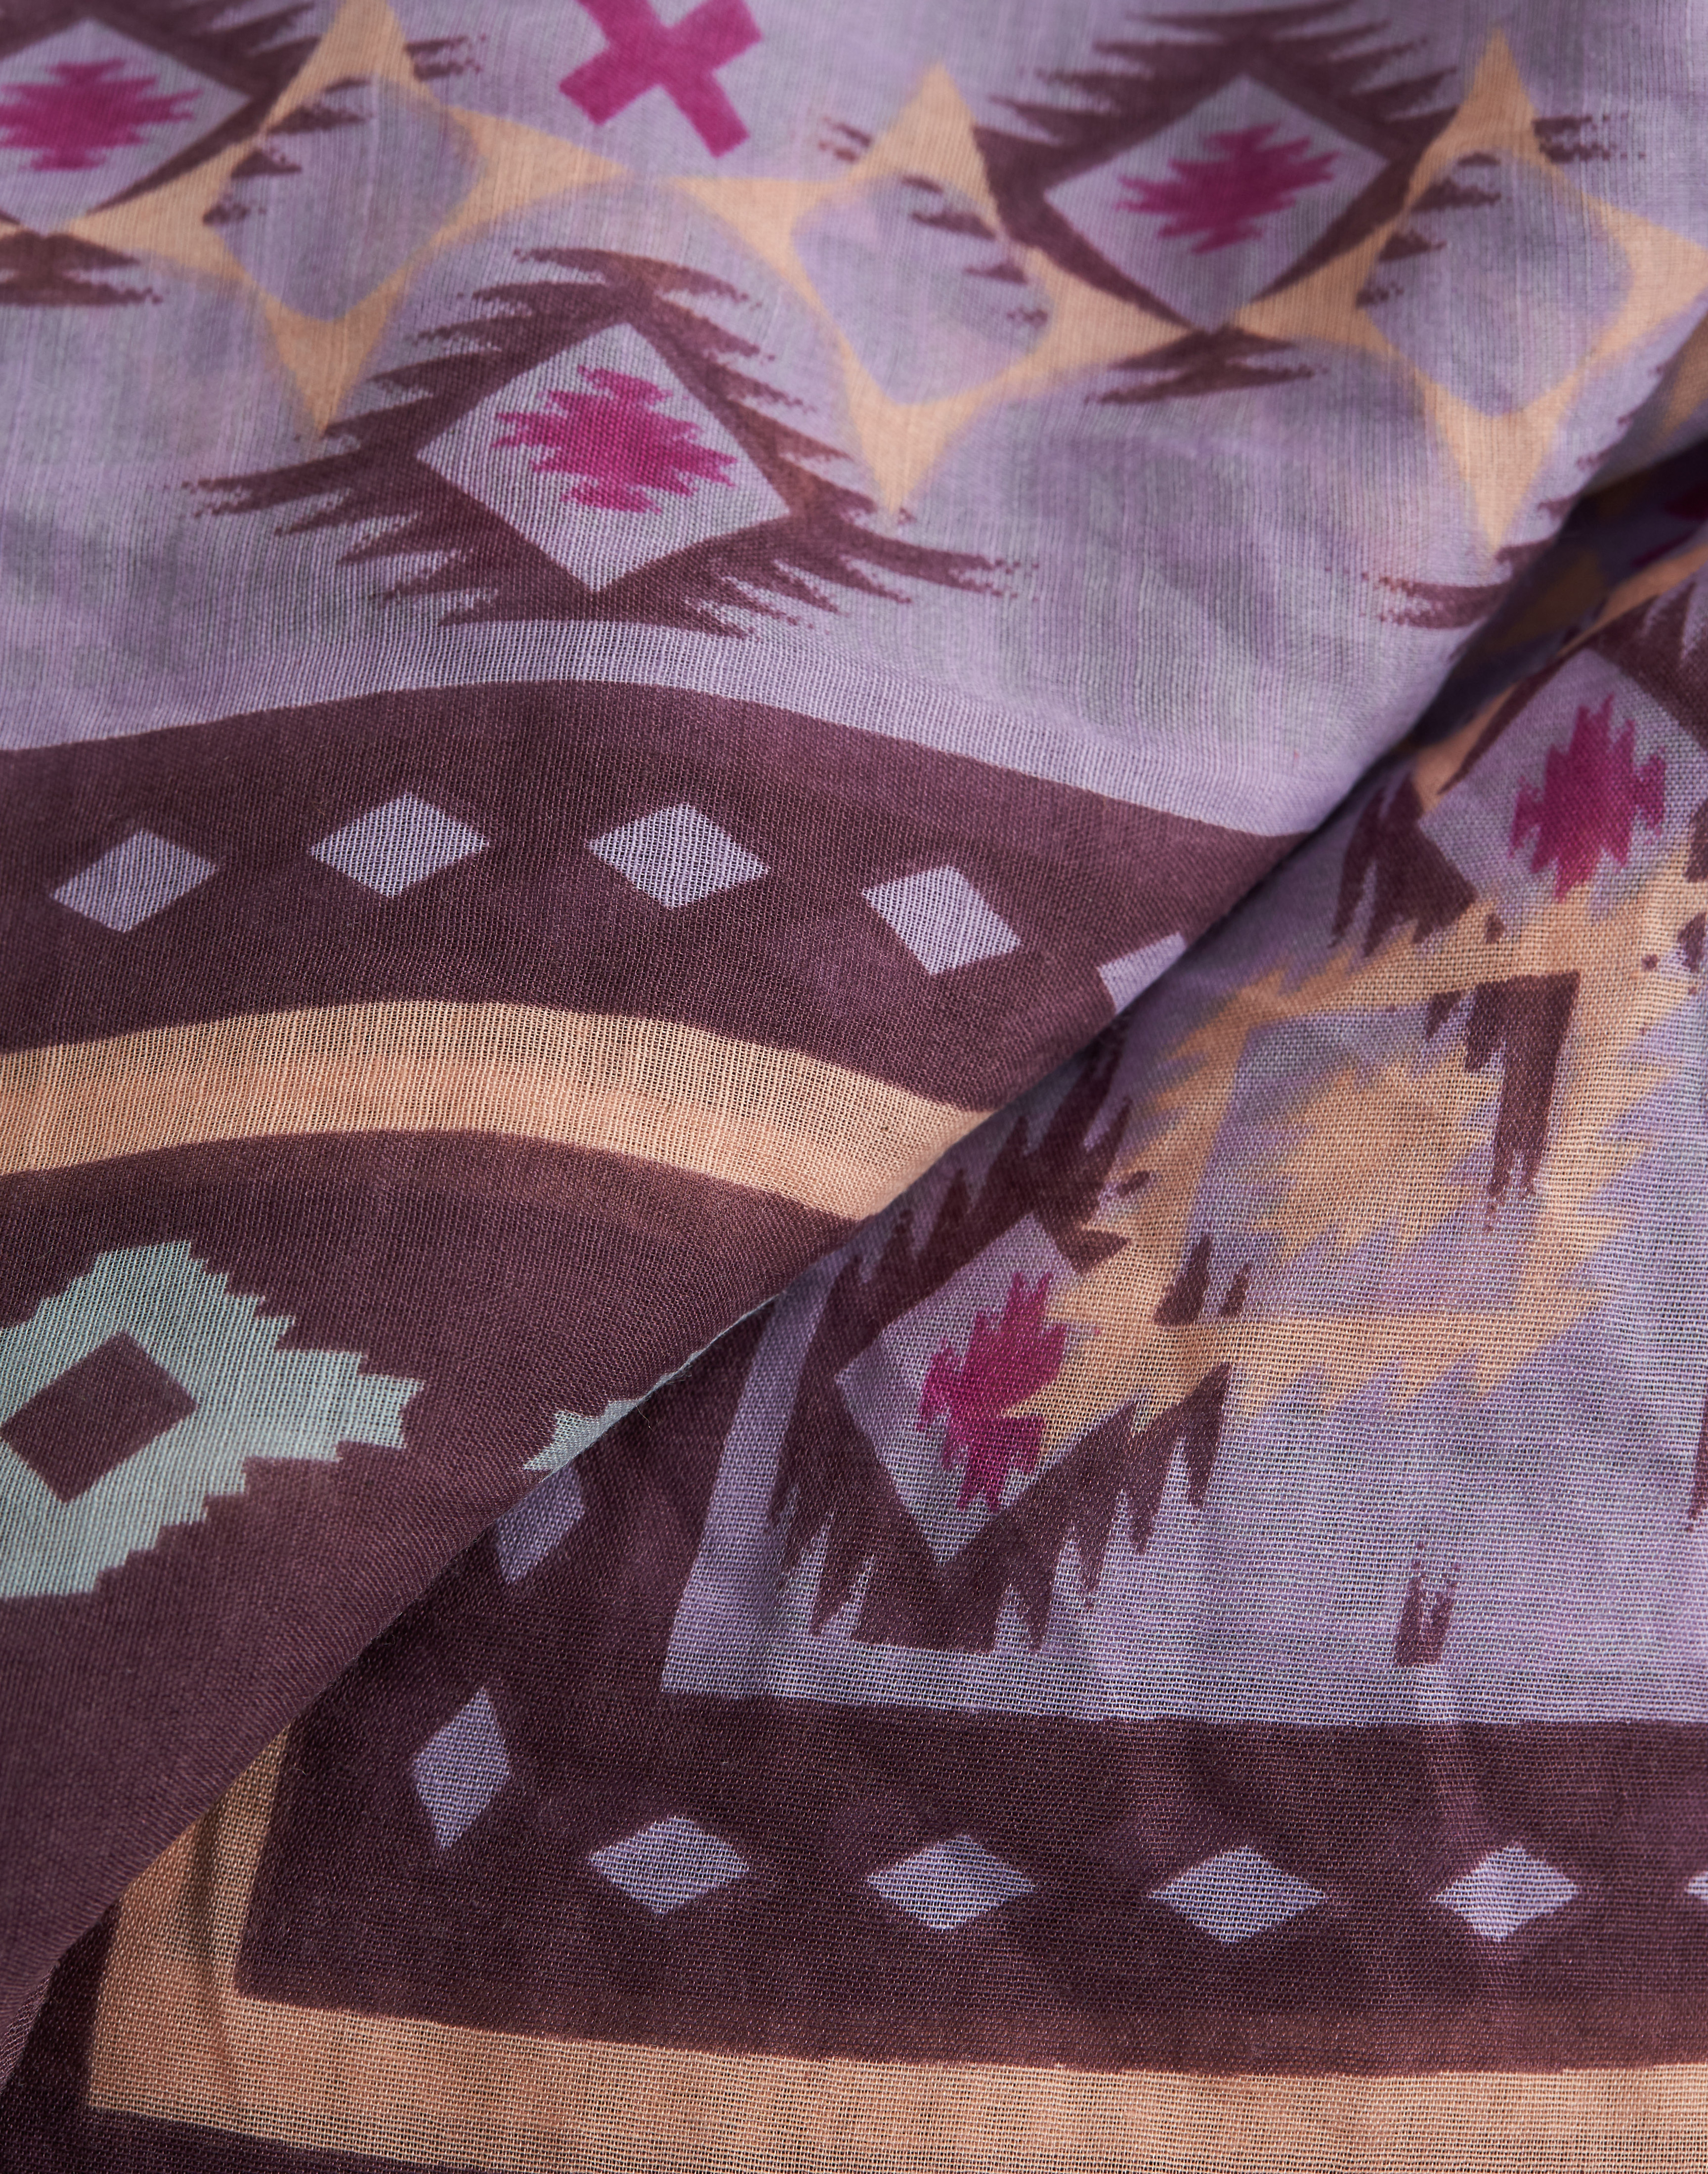 Fular print rombos azteca